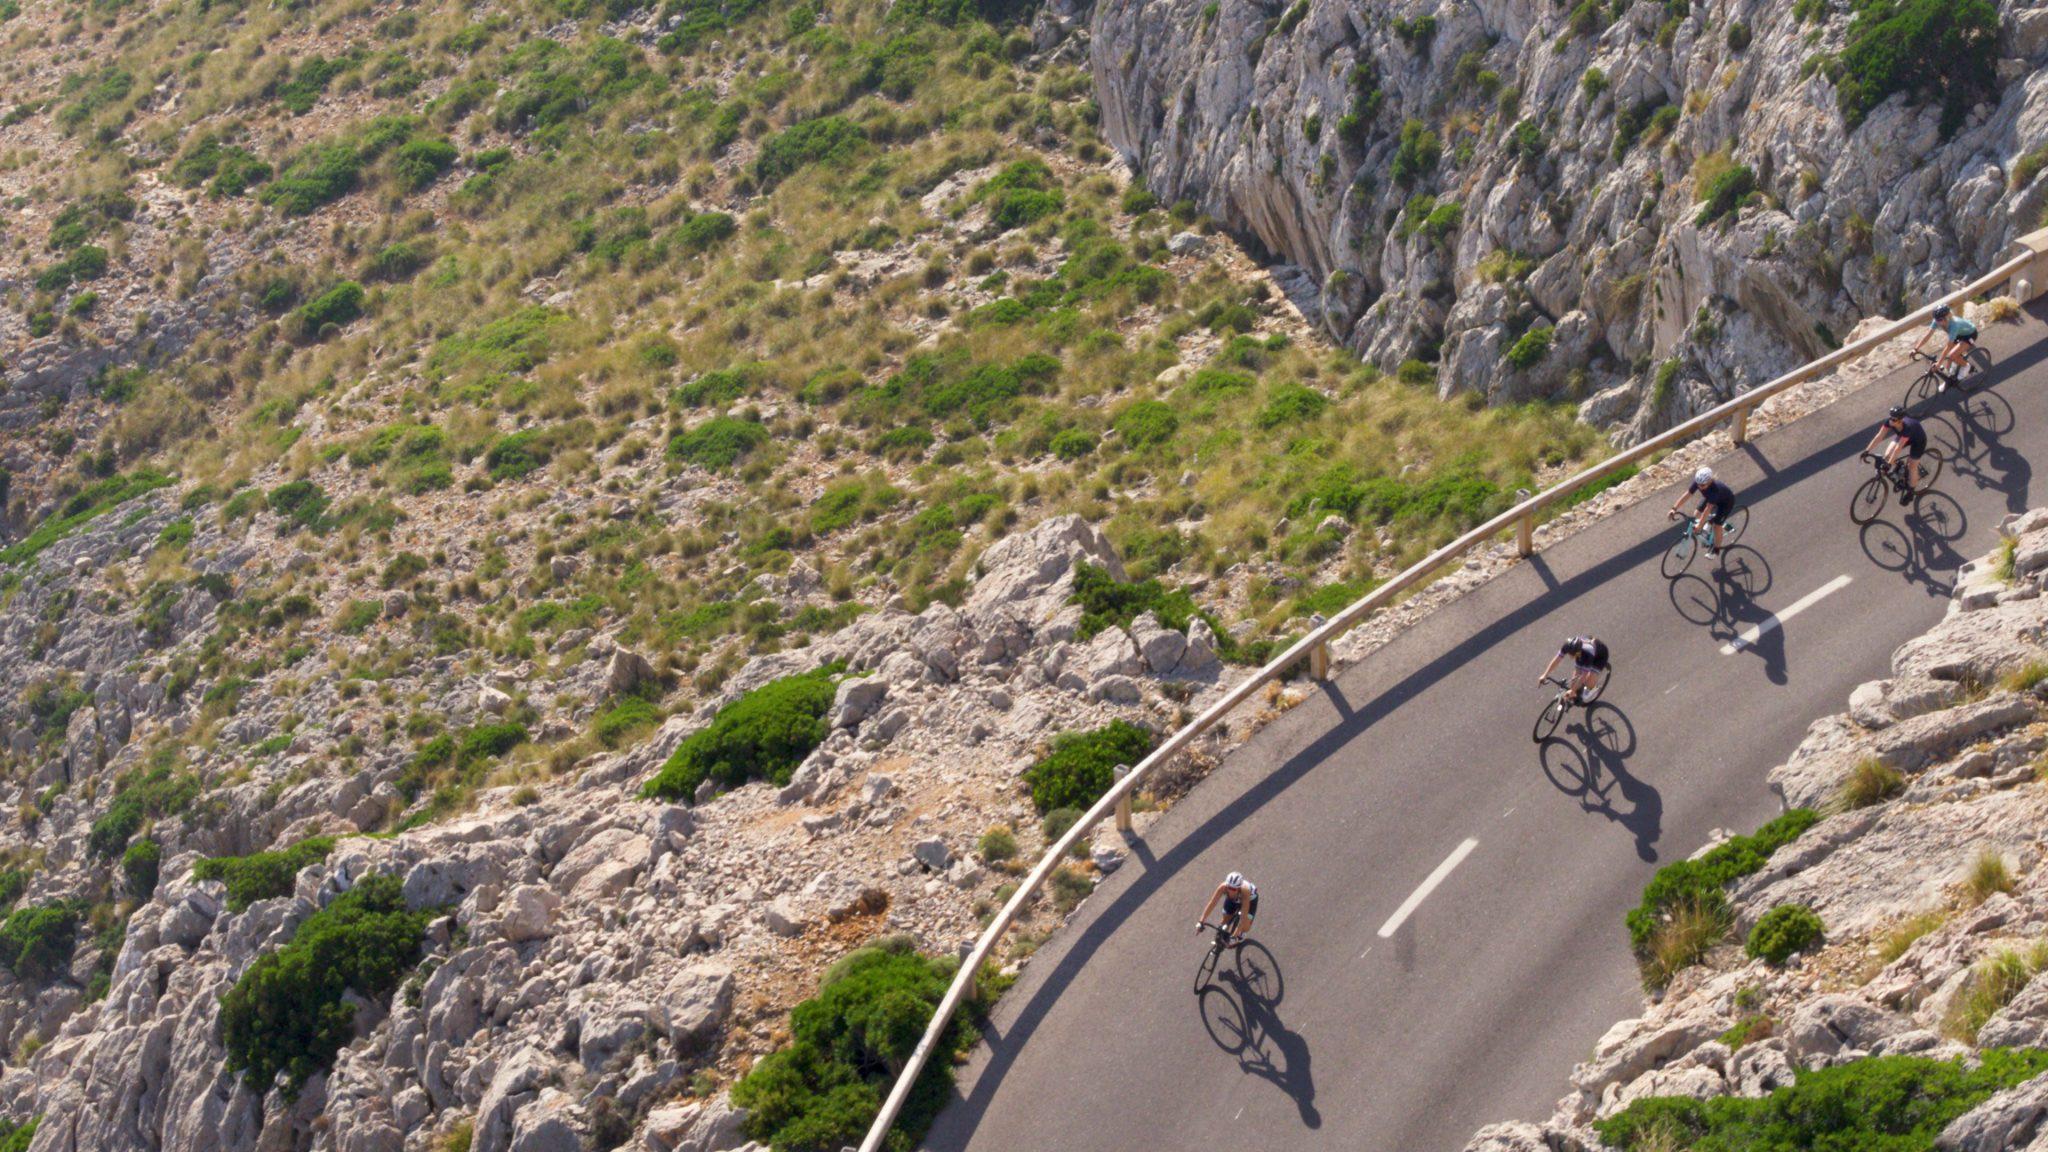 street cyclists